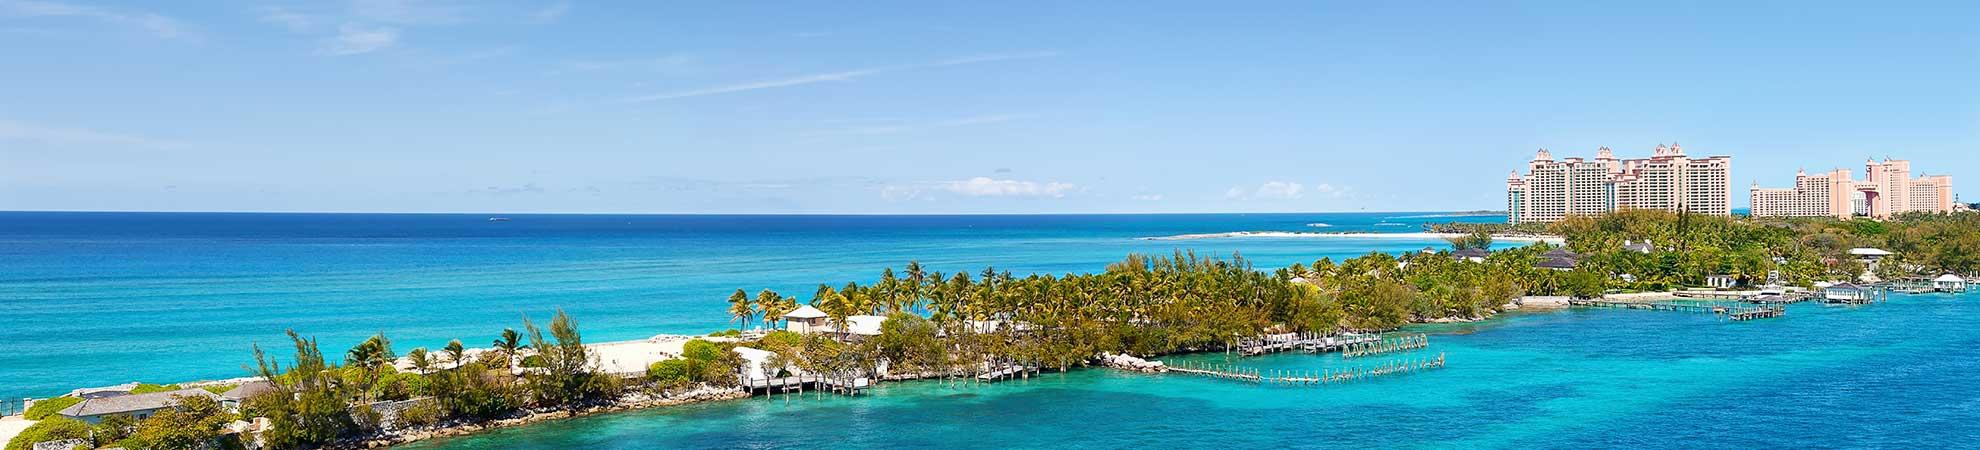 Voyage Miami Bahamas